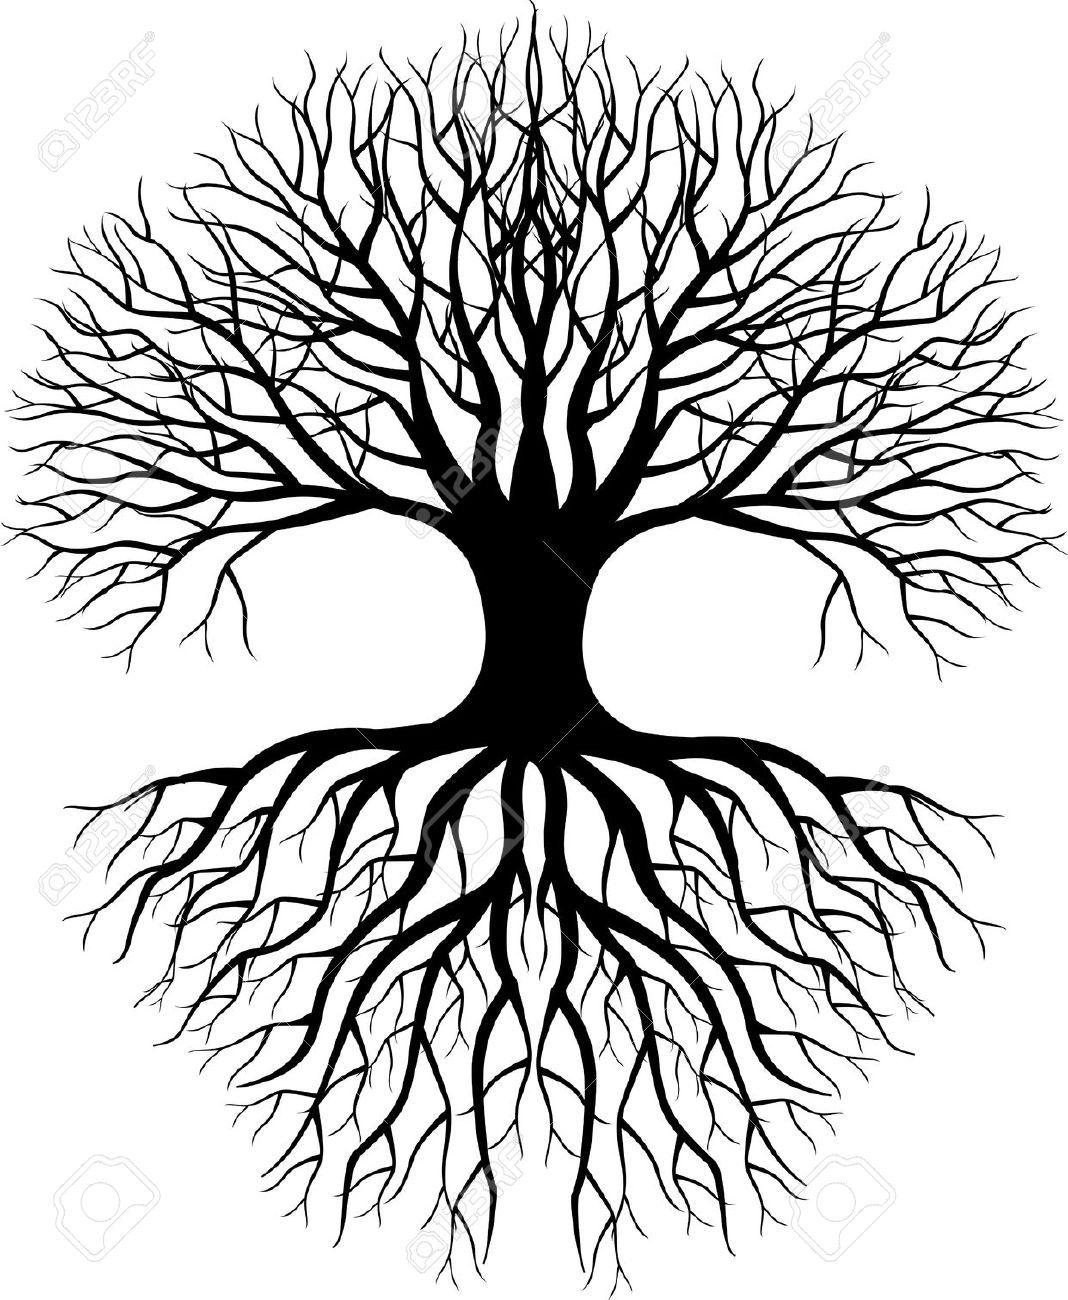 1068x1300 15234021 Tree Silhouette Life.jpg Stuff I Like